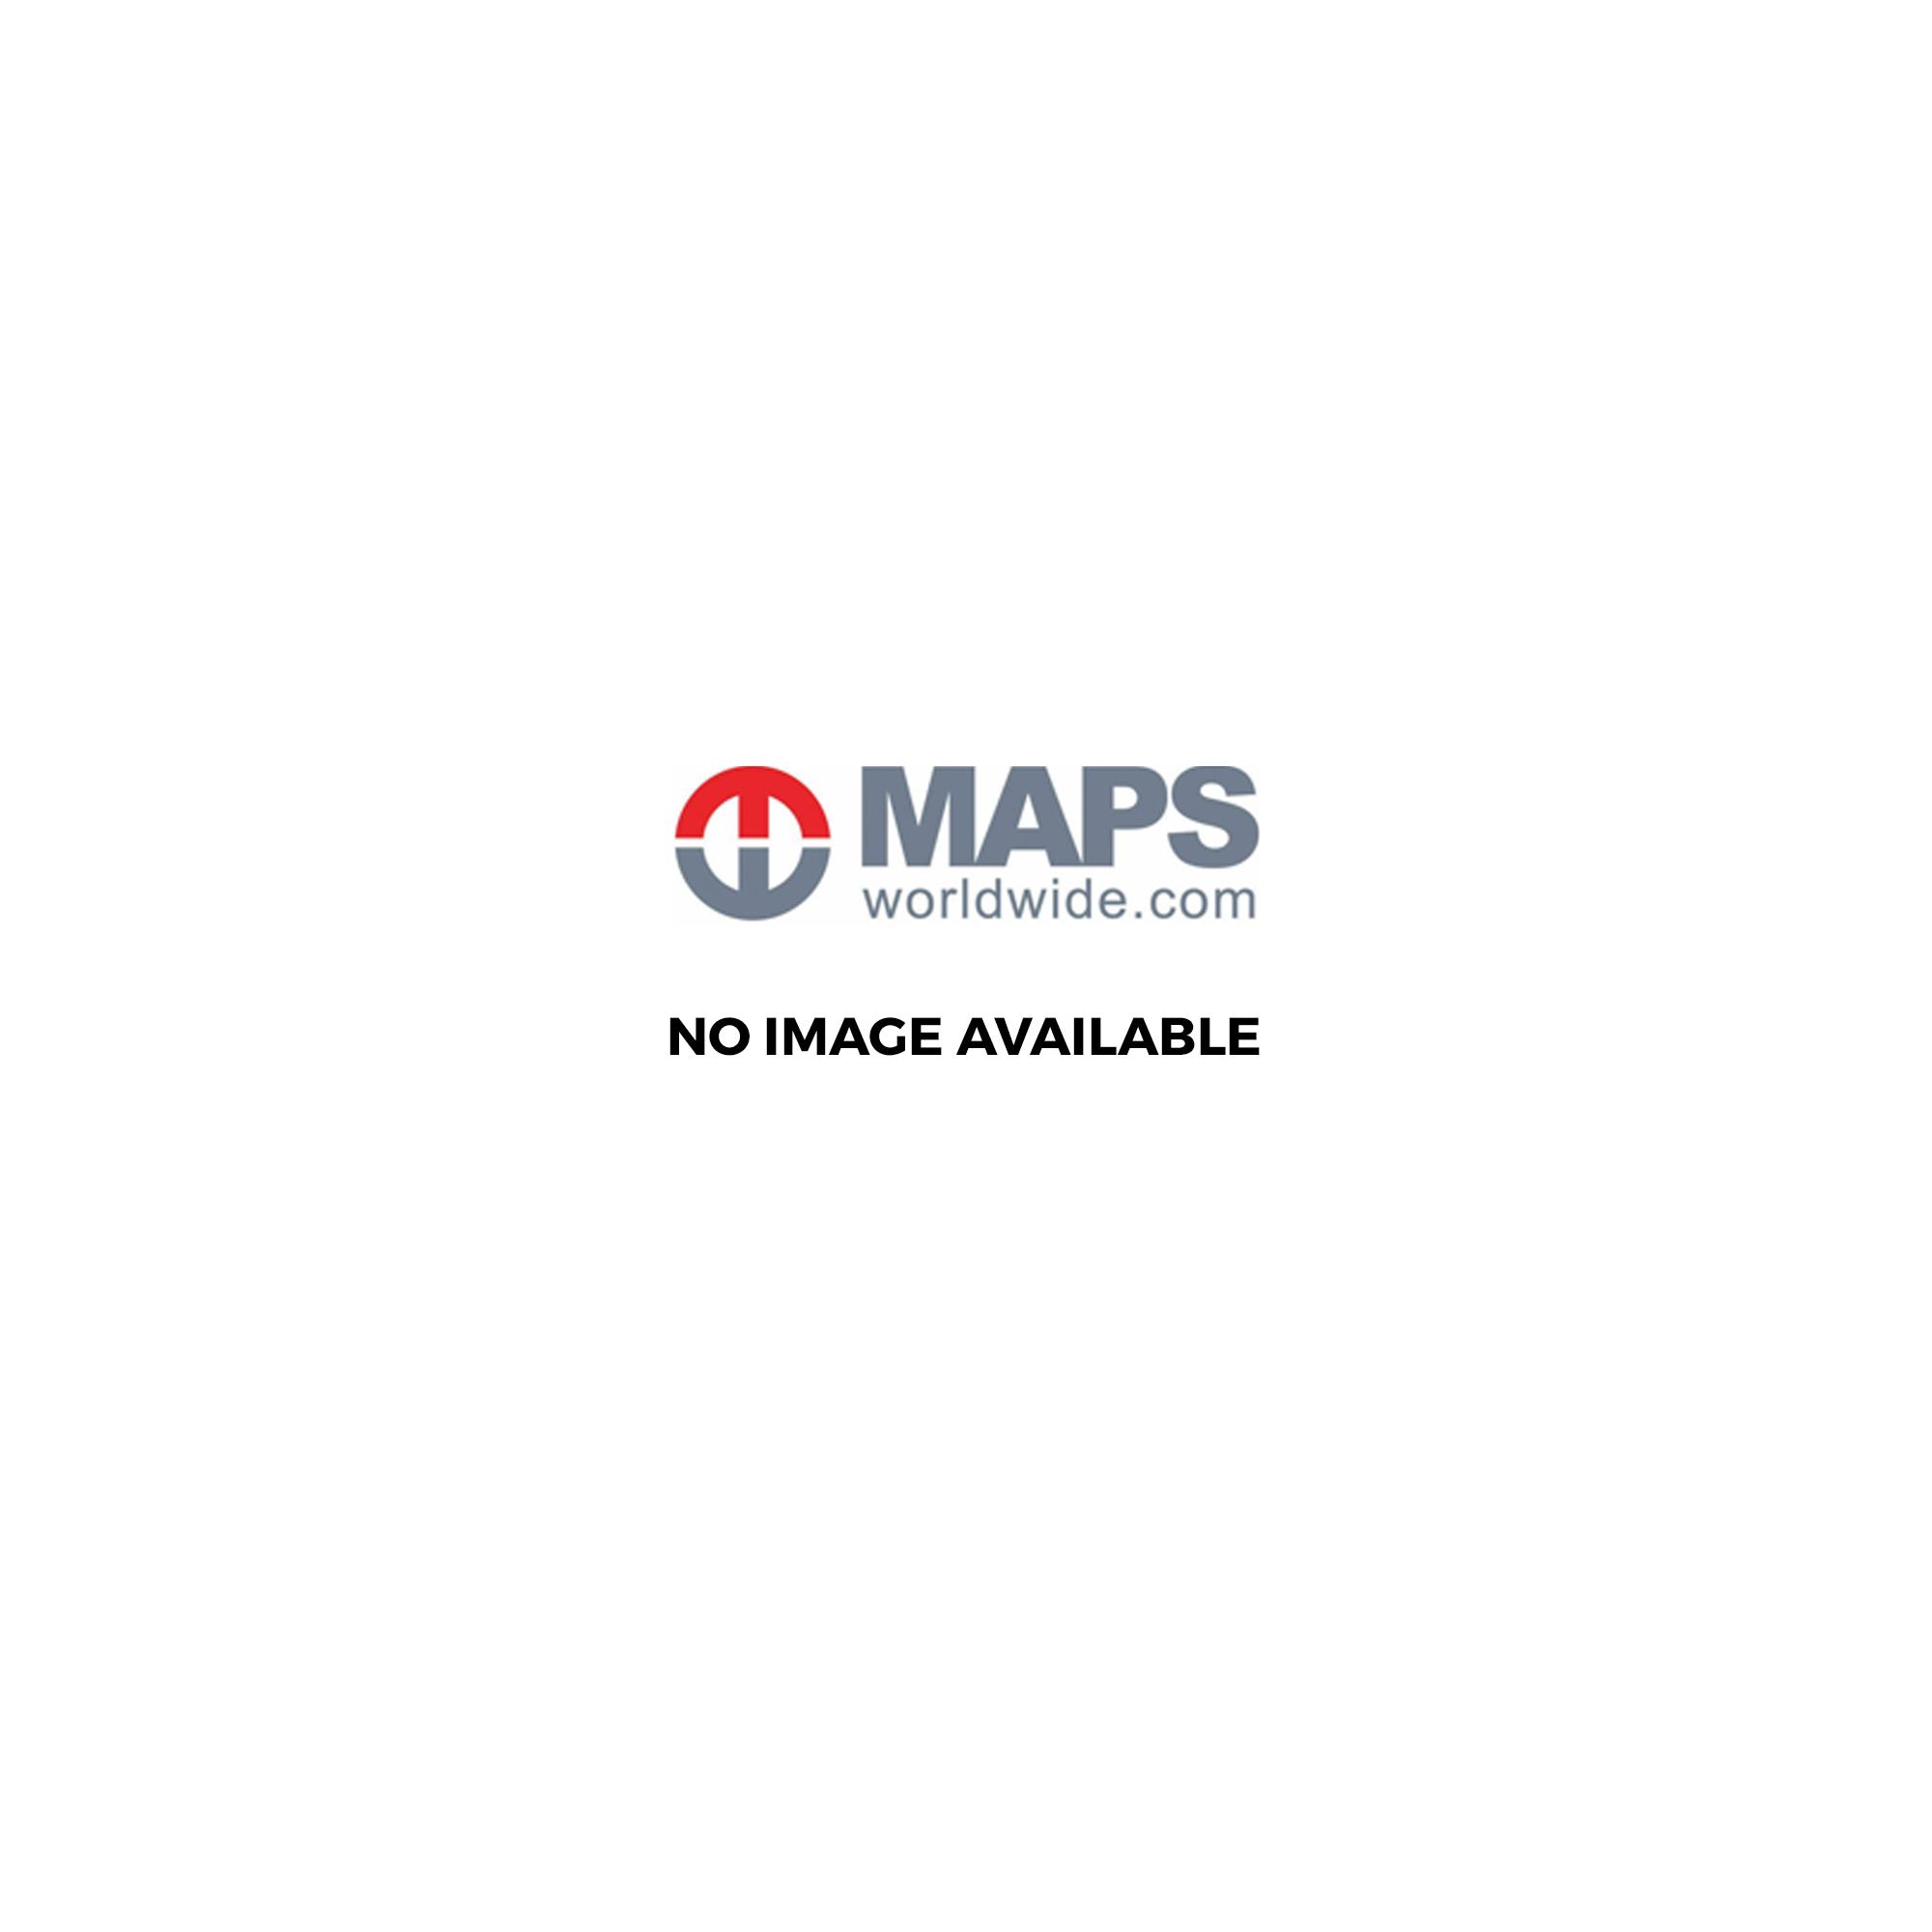 10061 Floro Norgeserien 150 000 Europe from Maps Worldwide UK